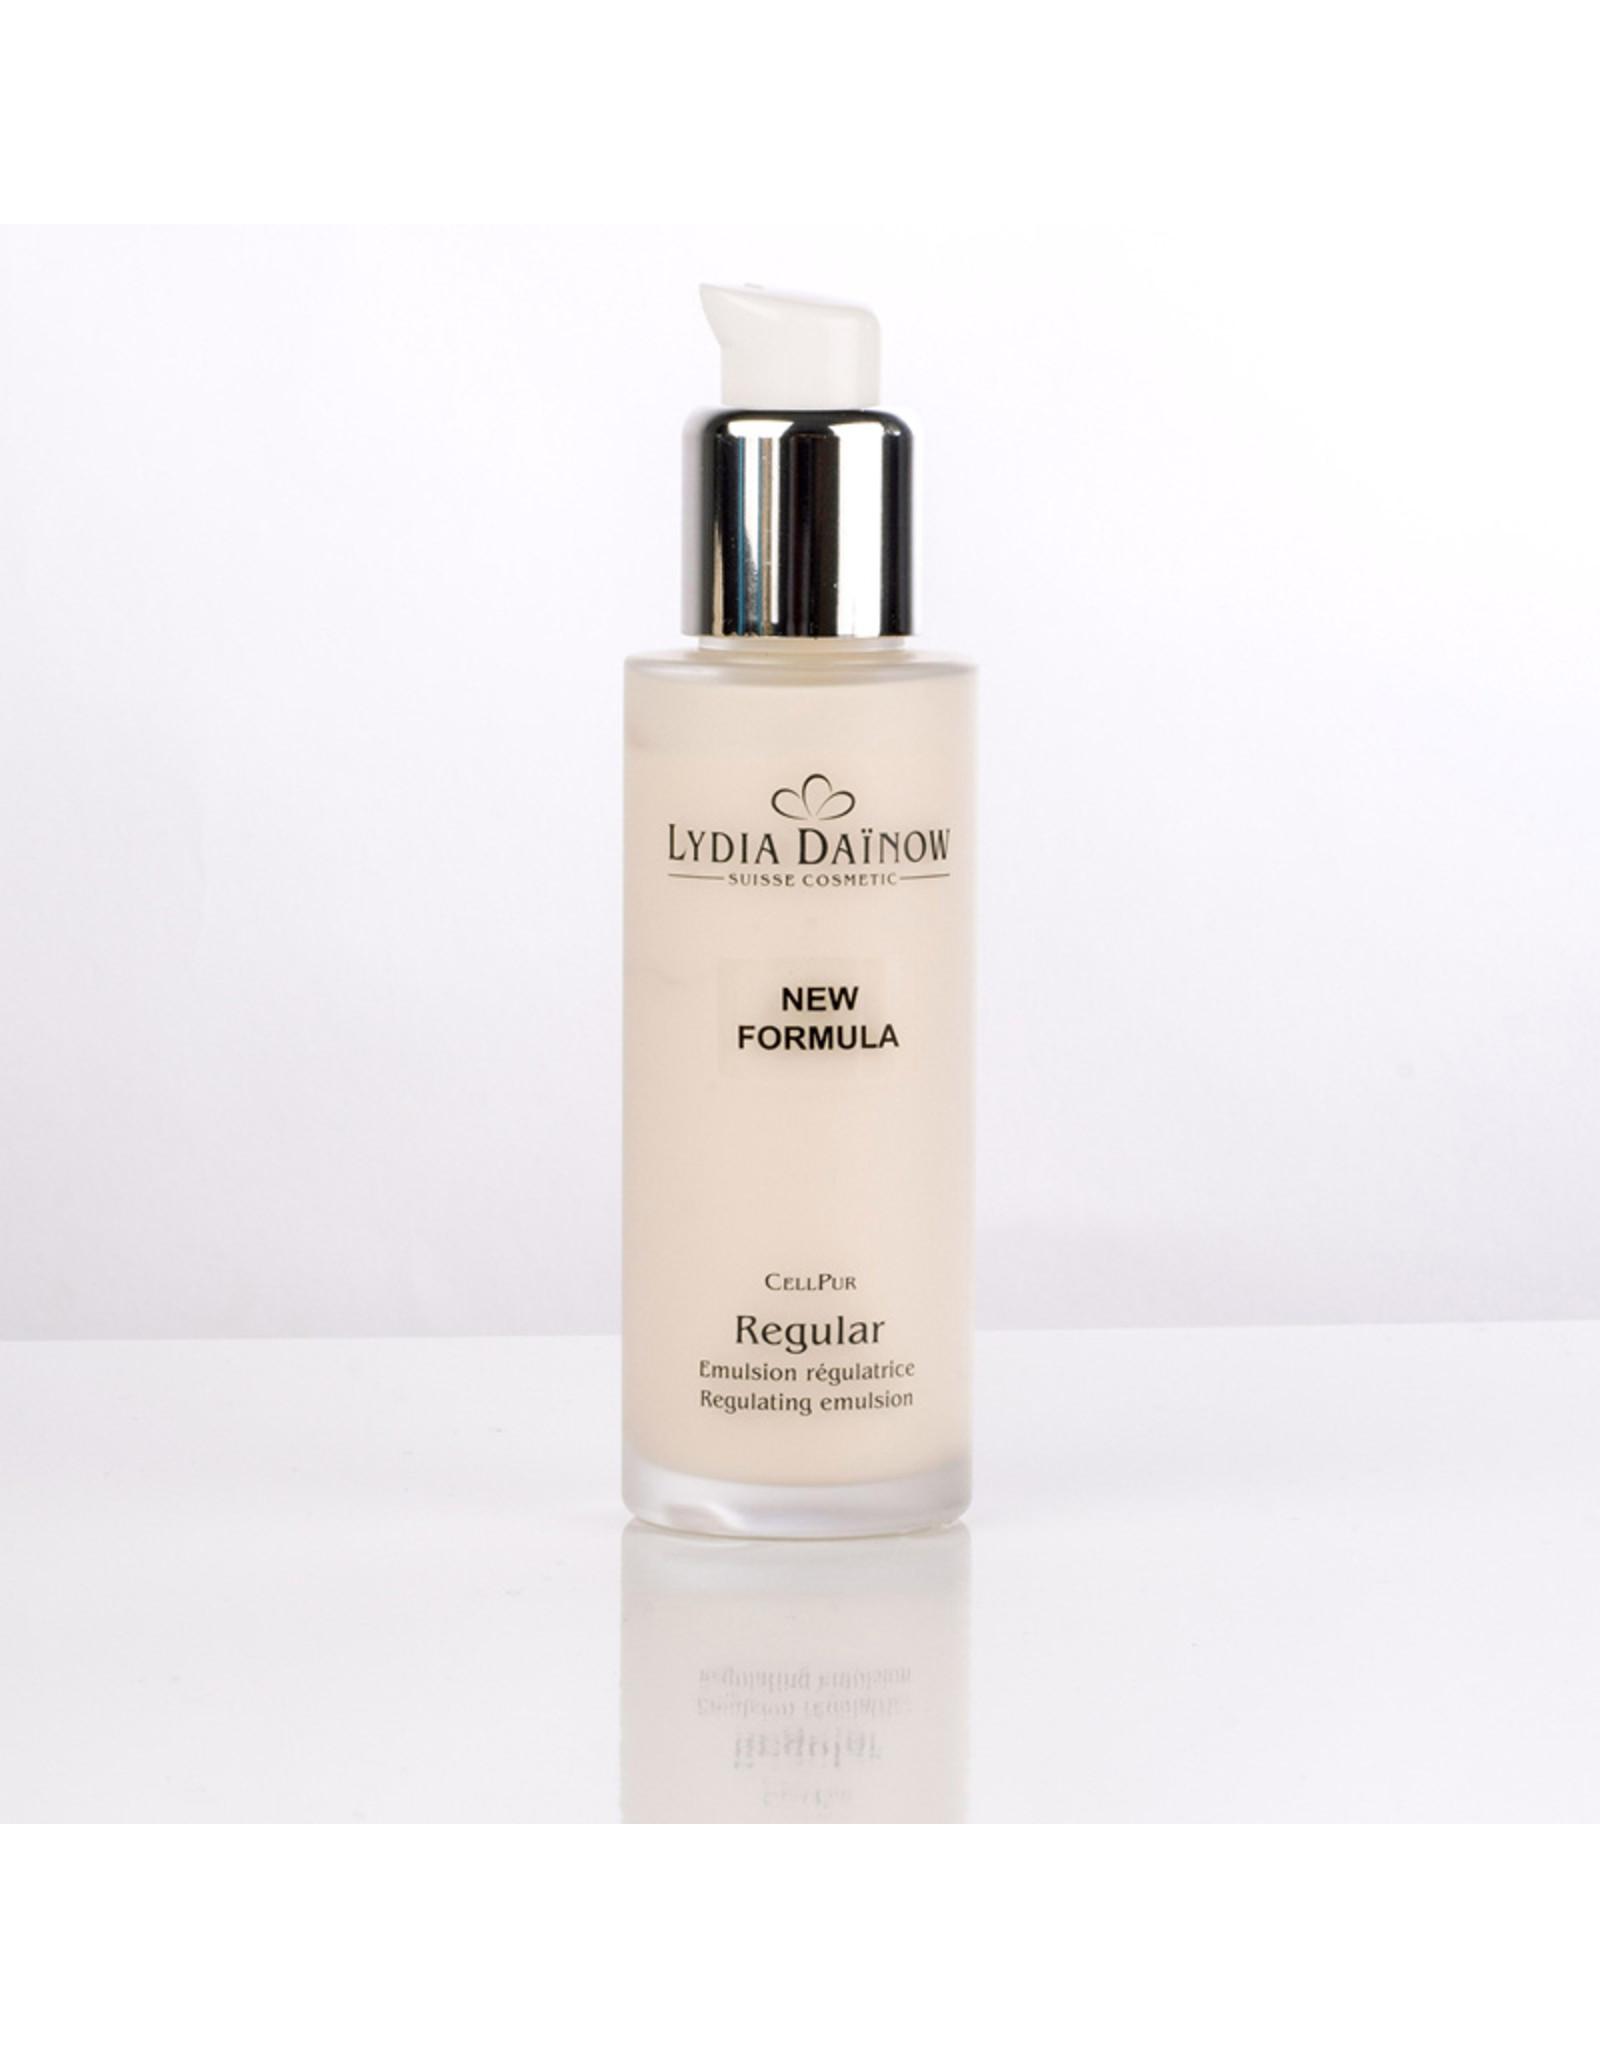 Lydïa Dainow Regular - Skin emulsion